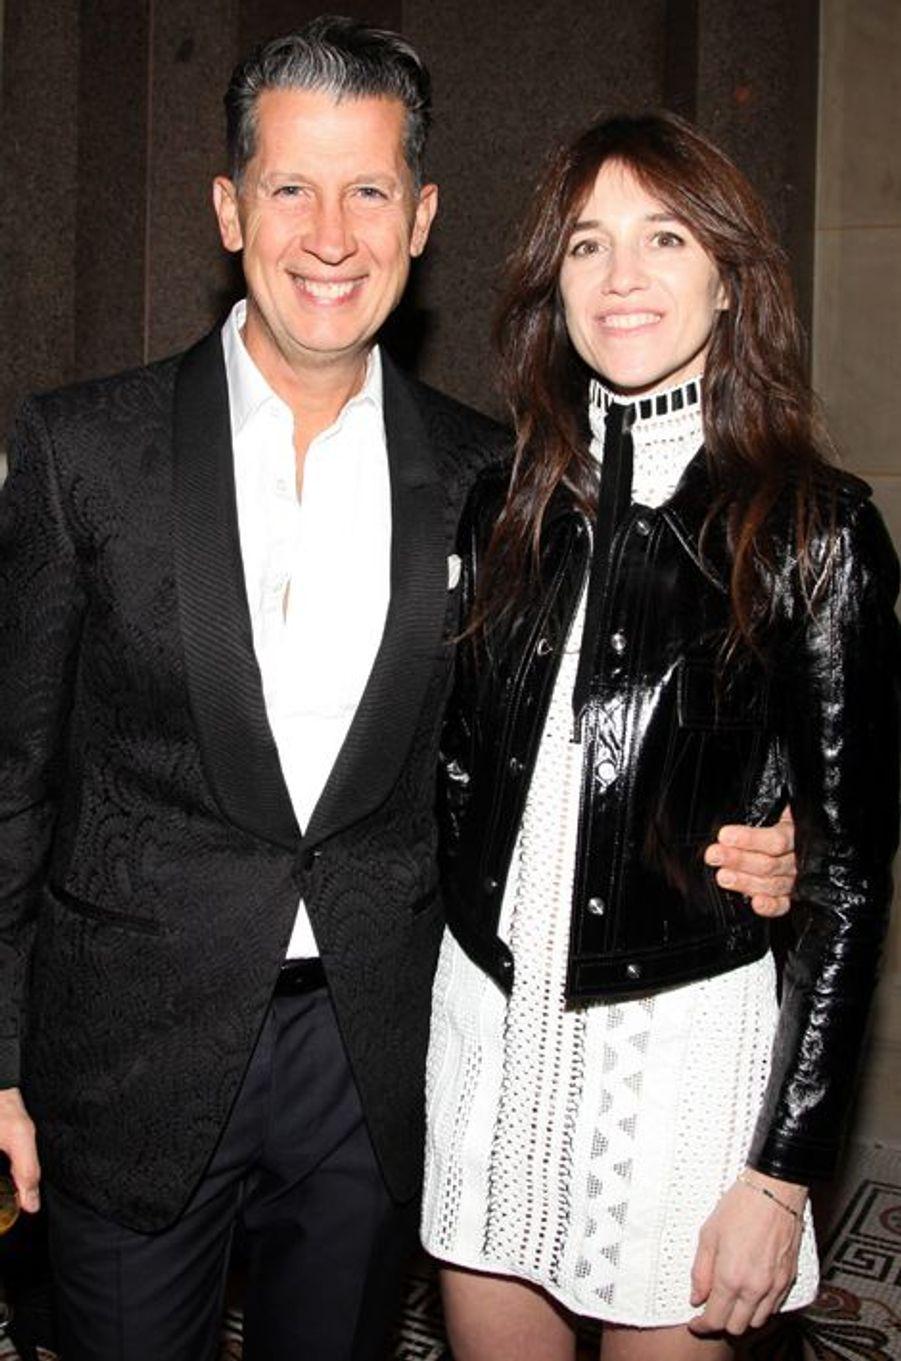 Stefano Tonchi et Charlotte Gainsbourg à New York le 4 novembre 2014